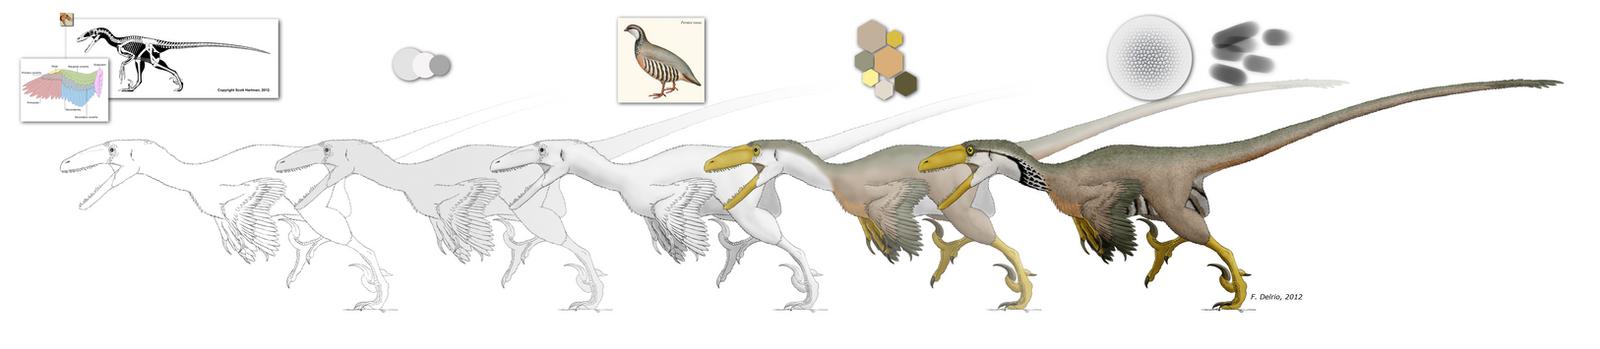 Deinonychus WIP by DELIRIO88